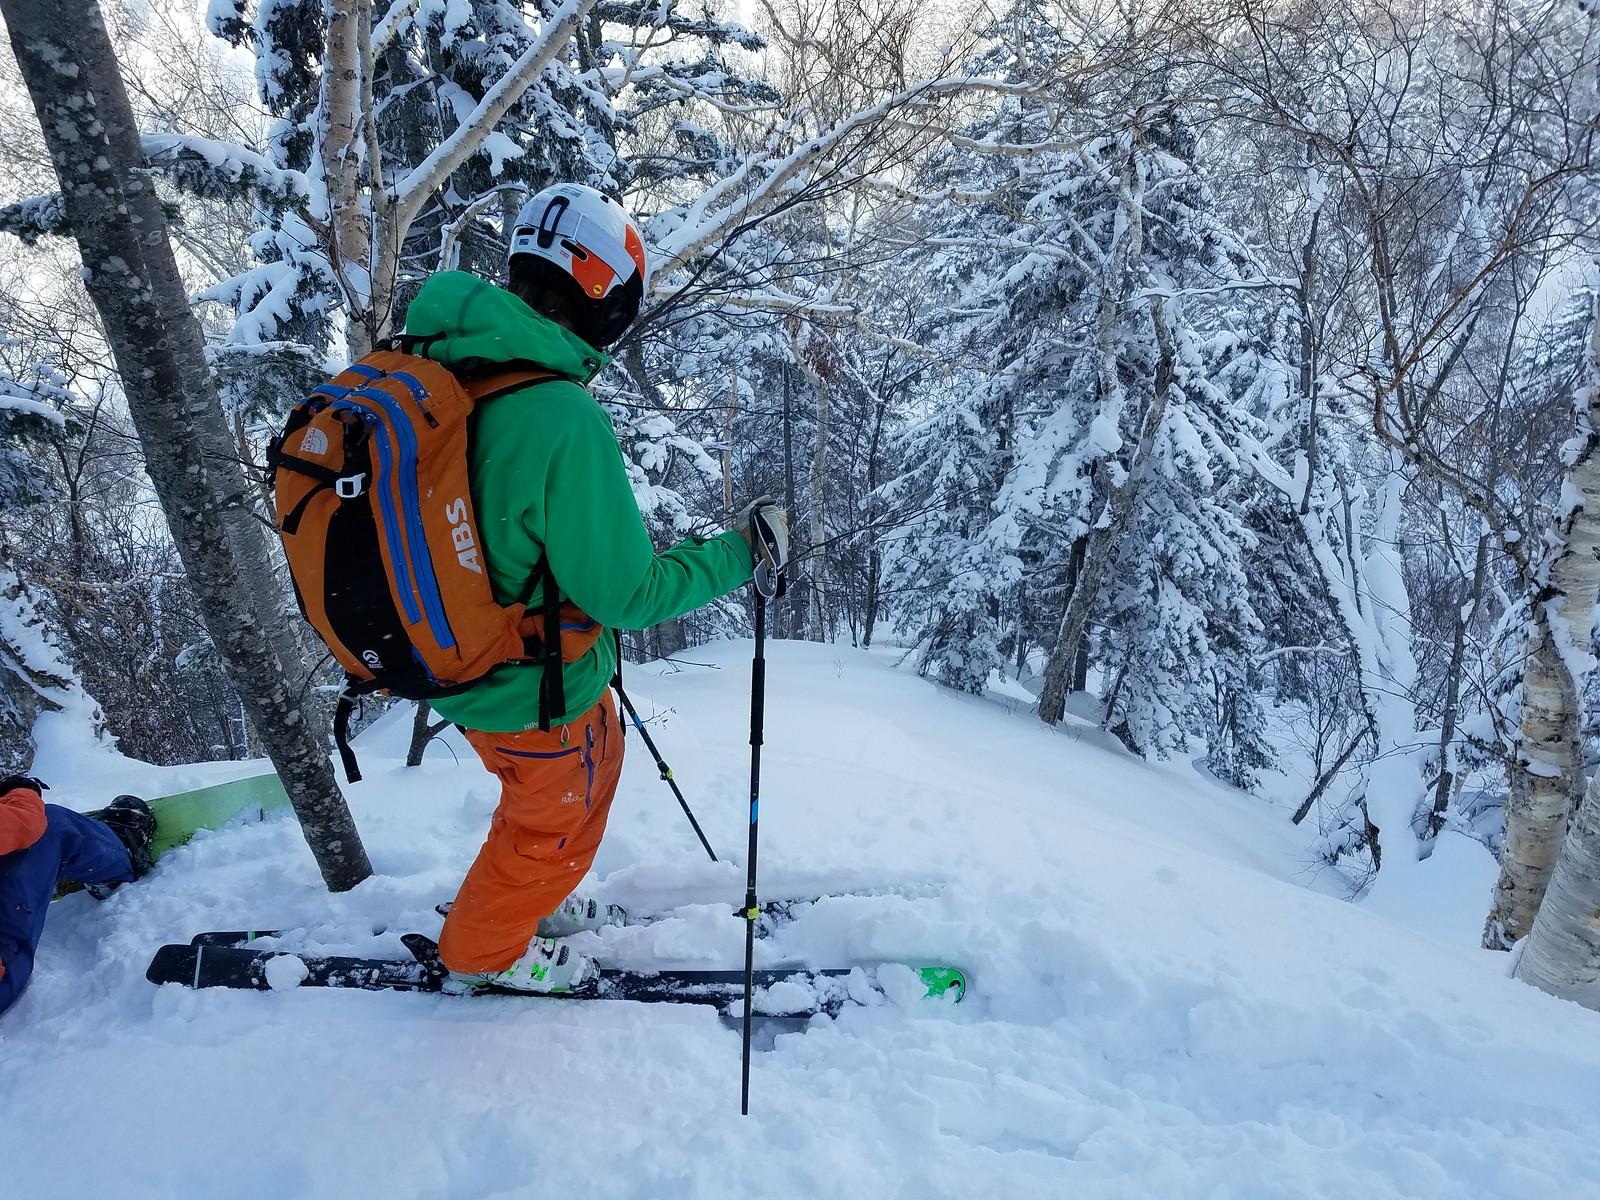 Skiing the slopes next to Hiyamizu Hut near Mt. Sapporo (Hokkaido, Japan)